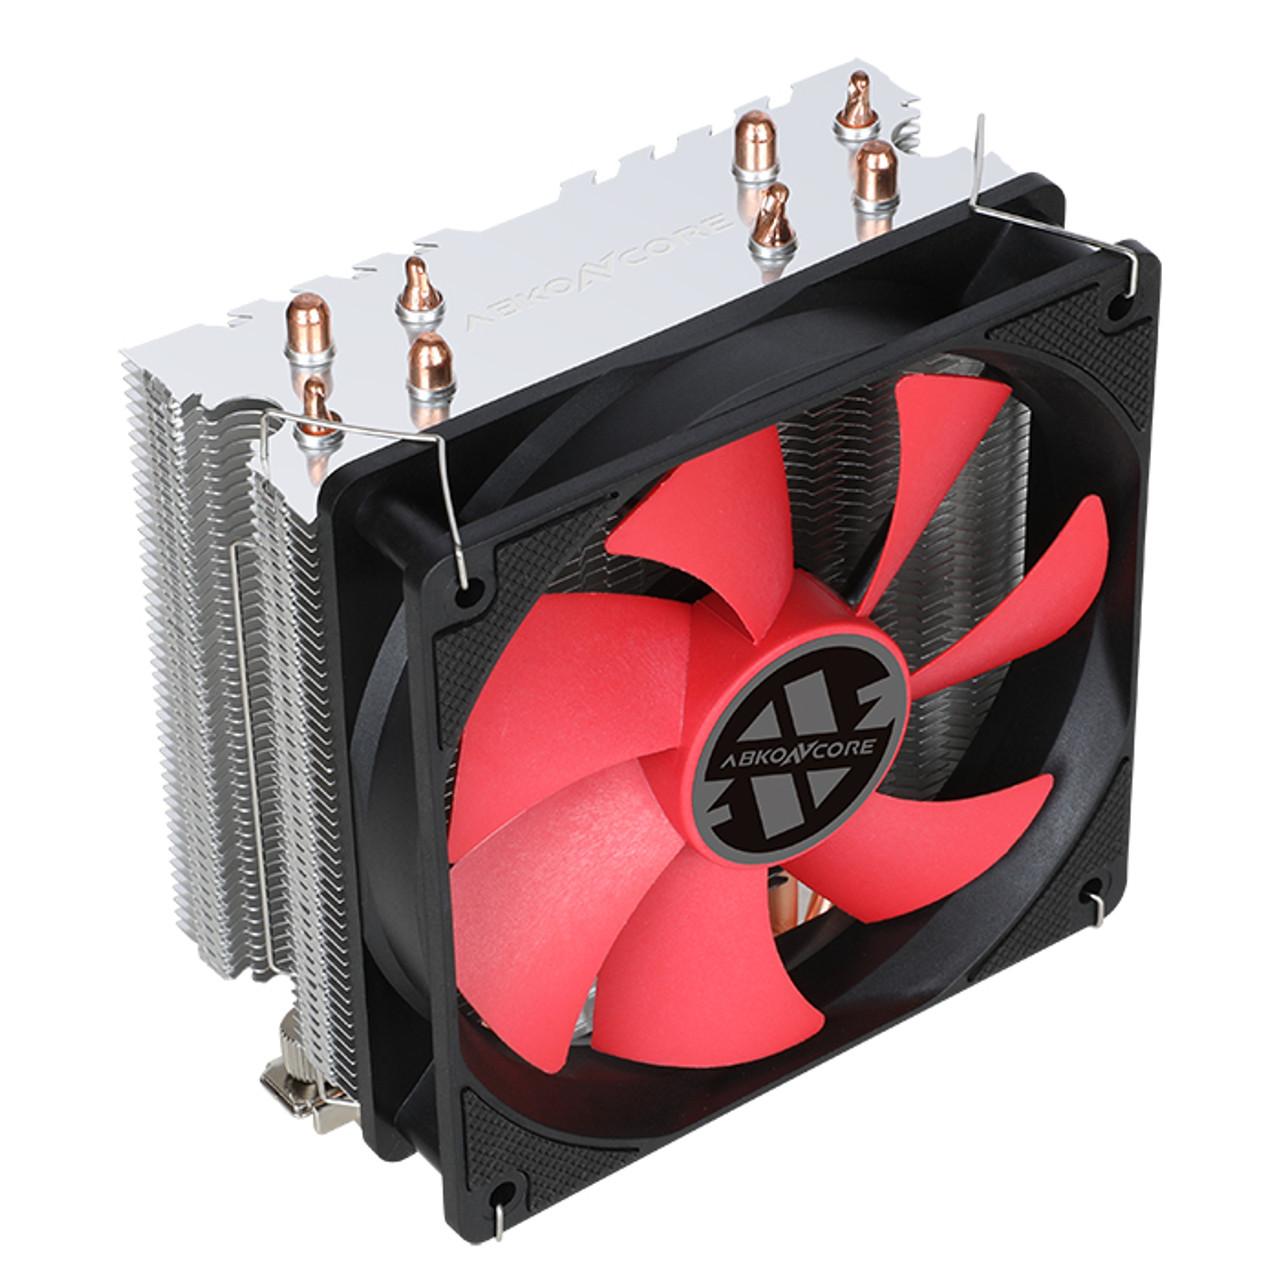 ABKONCORE CPU COOLER COOLSTORM T401